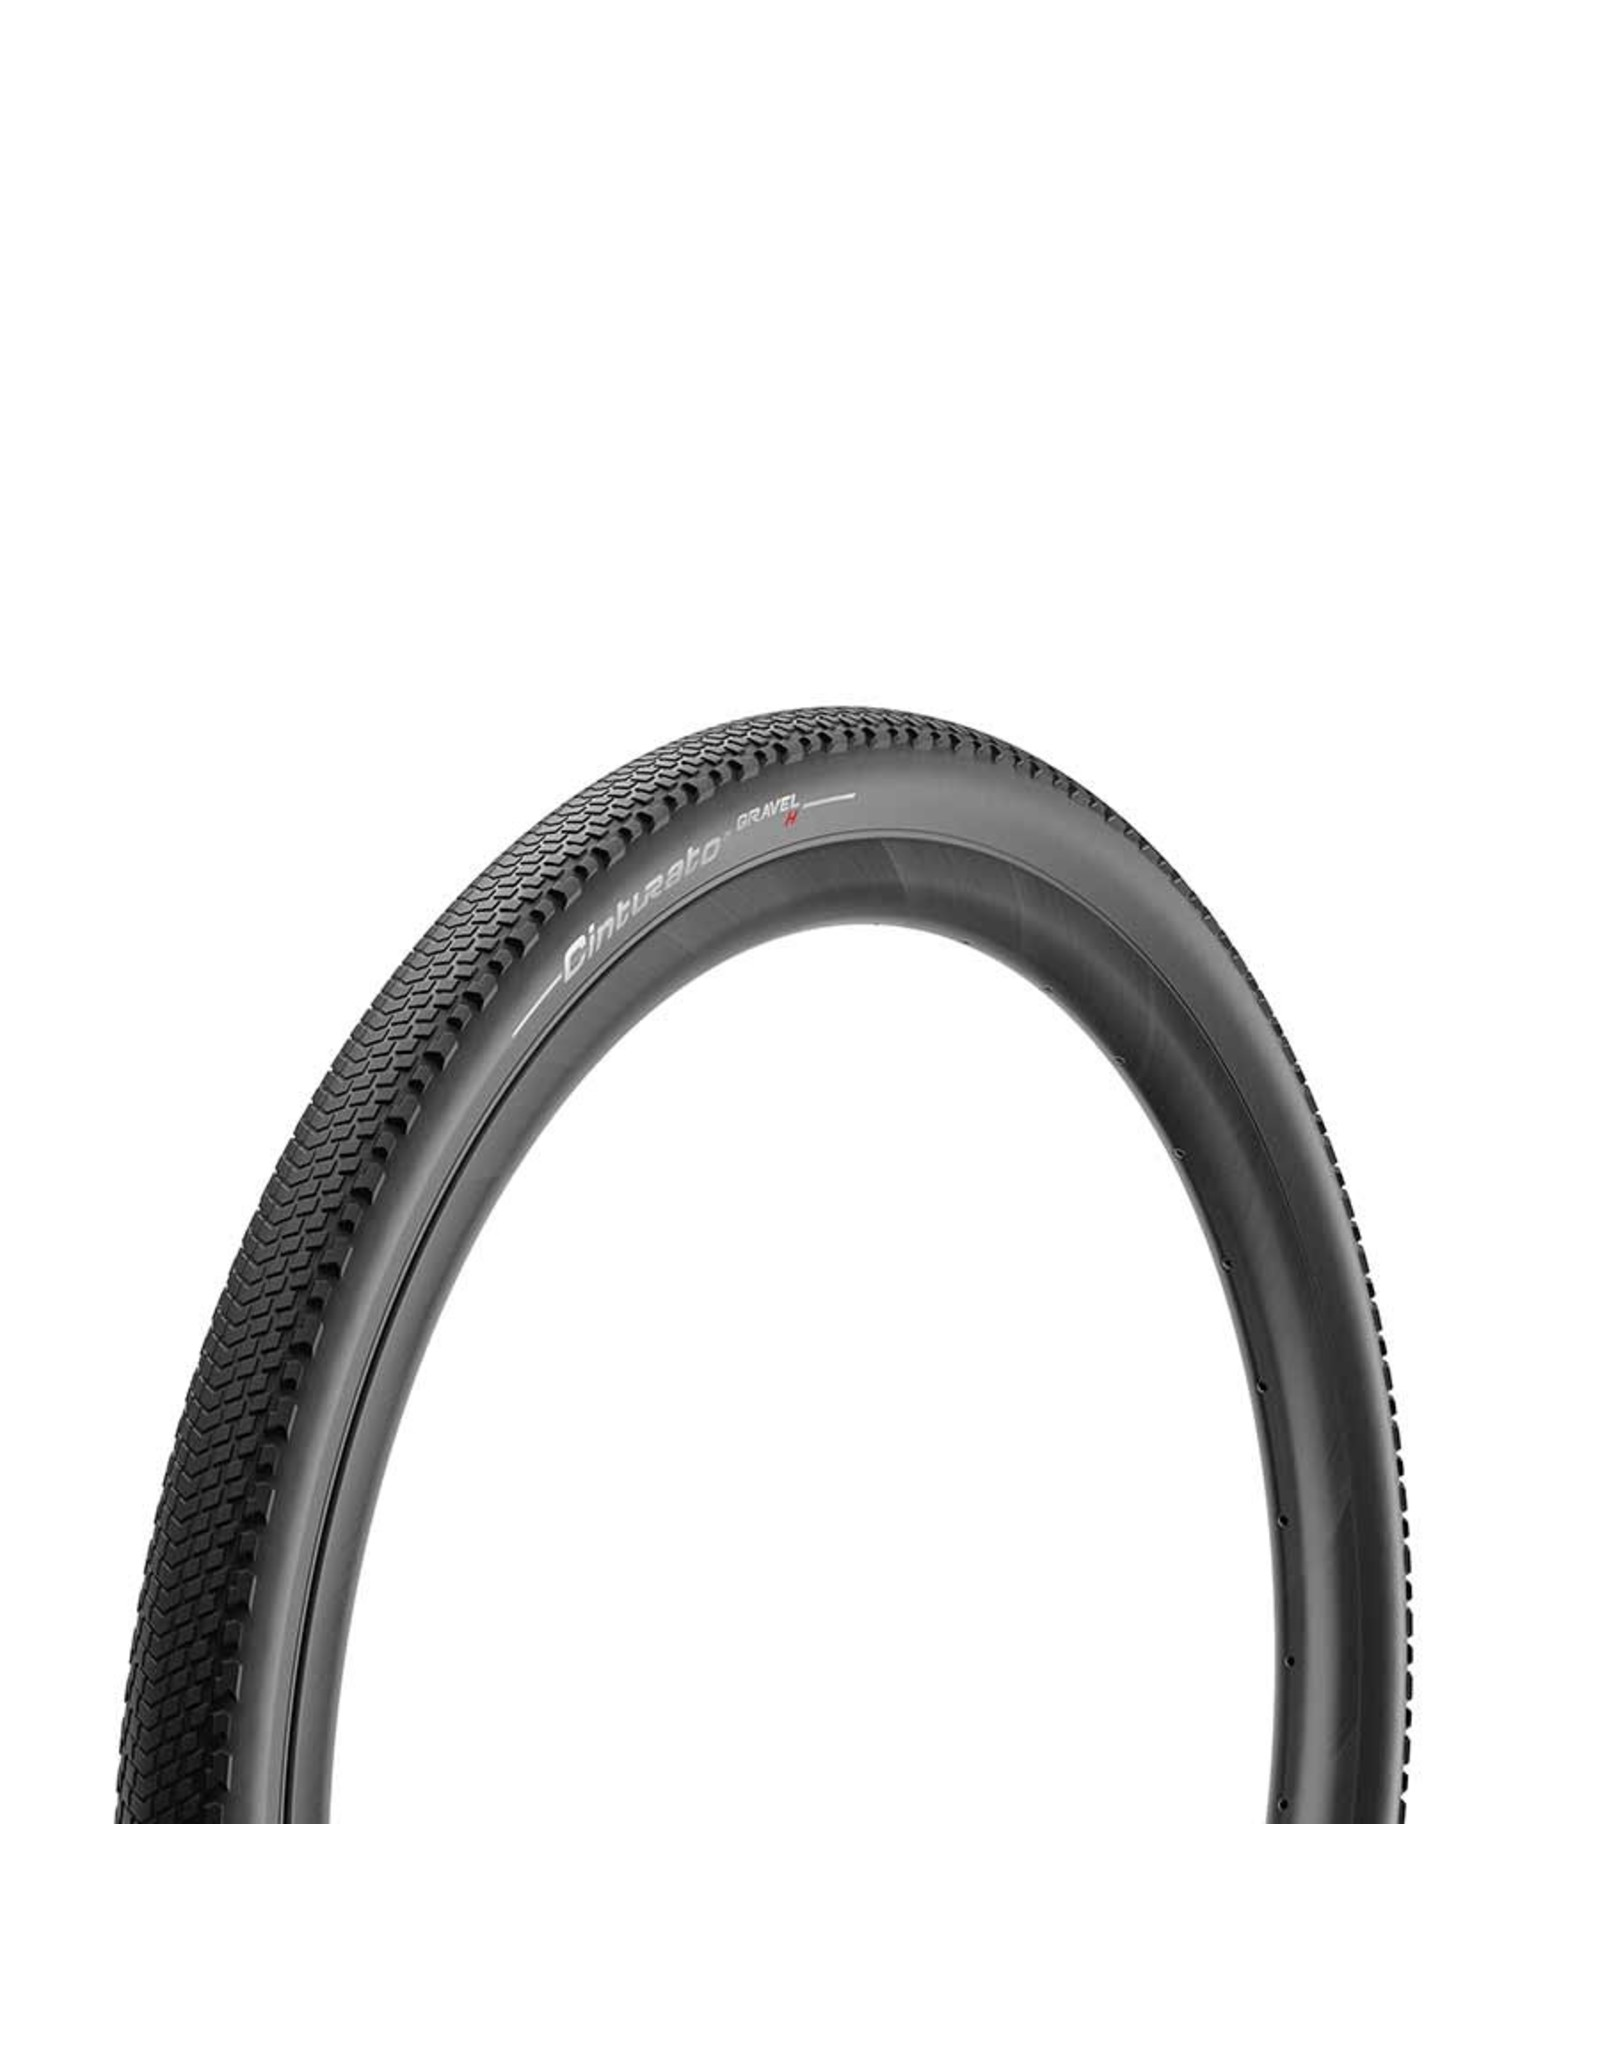 Pirelli, Cinturato Gravel H, Tire, 700x45C, Folding, Tubeless Ready, SpeedGrip, 127TPI, Black